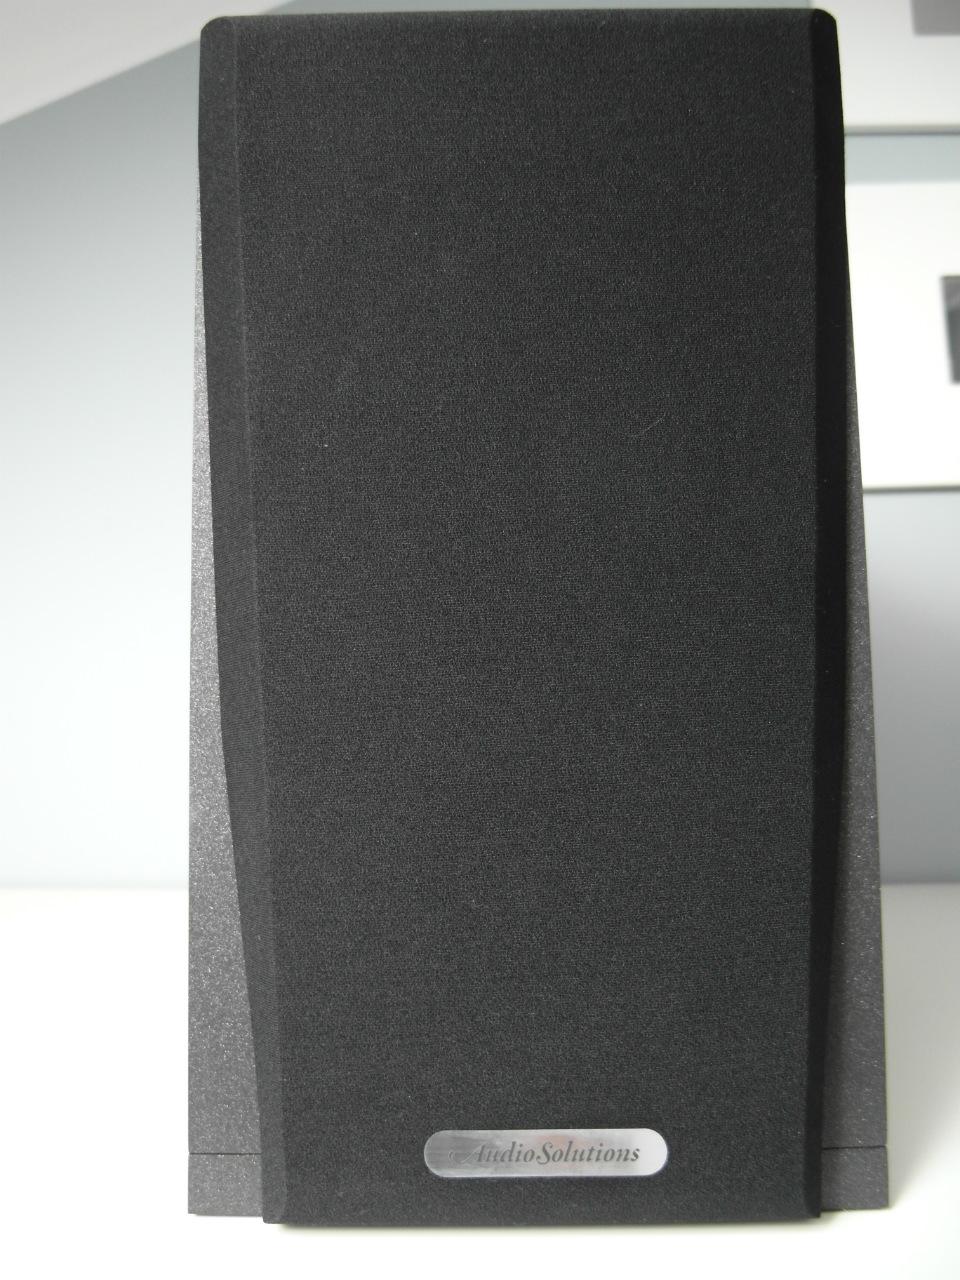 Audio Solutions Overture O202B można słuchać z maskownicami ... (fot. wstereo.pl)